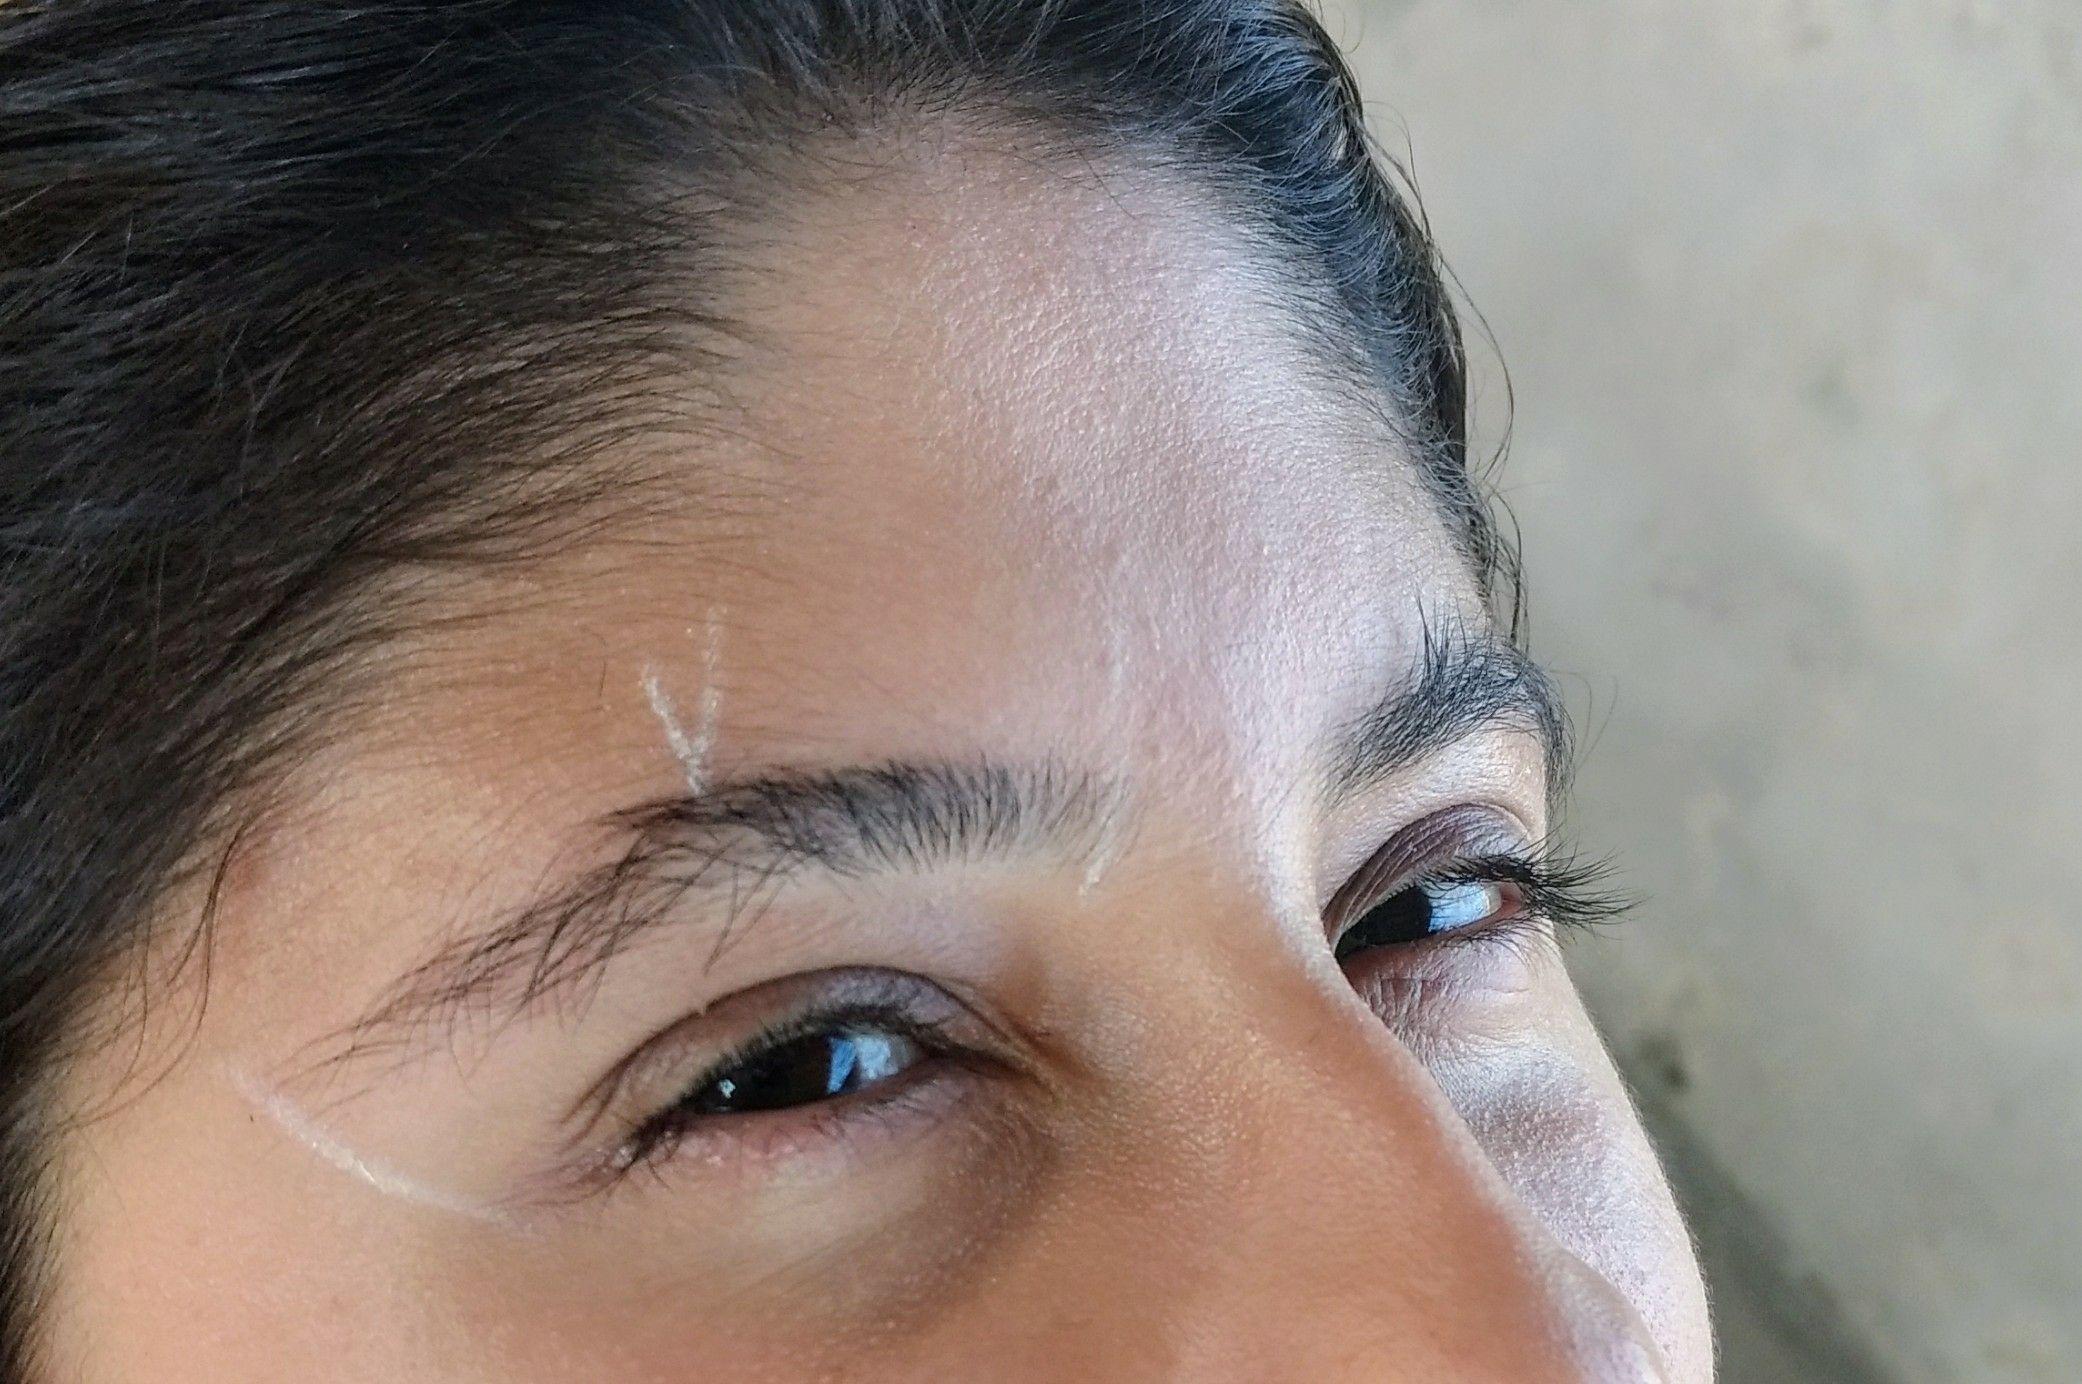 designer de sobrancelhas auxiliar administrativo designer de sobrancelhas designer de sobrancelhas designer de sobrancelhas